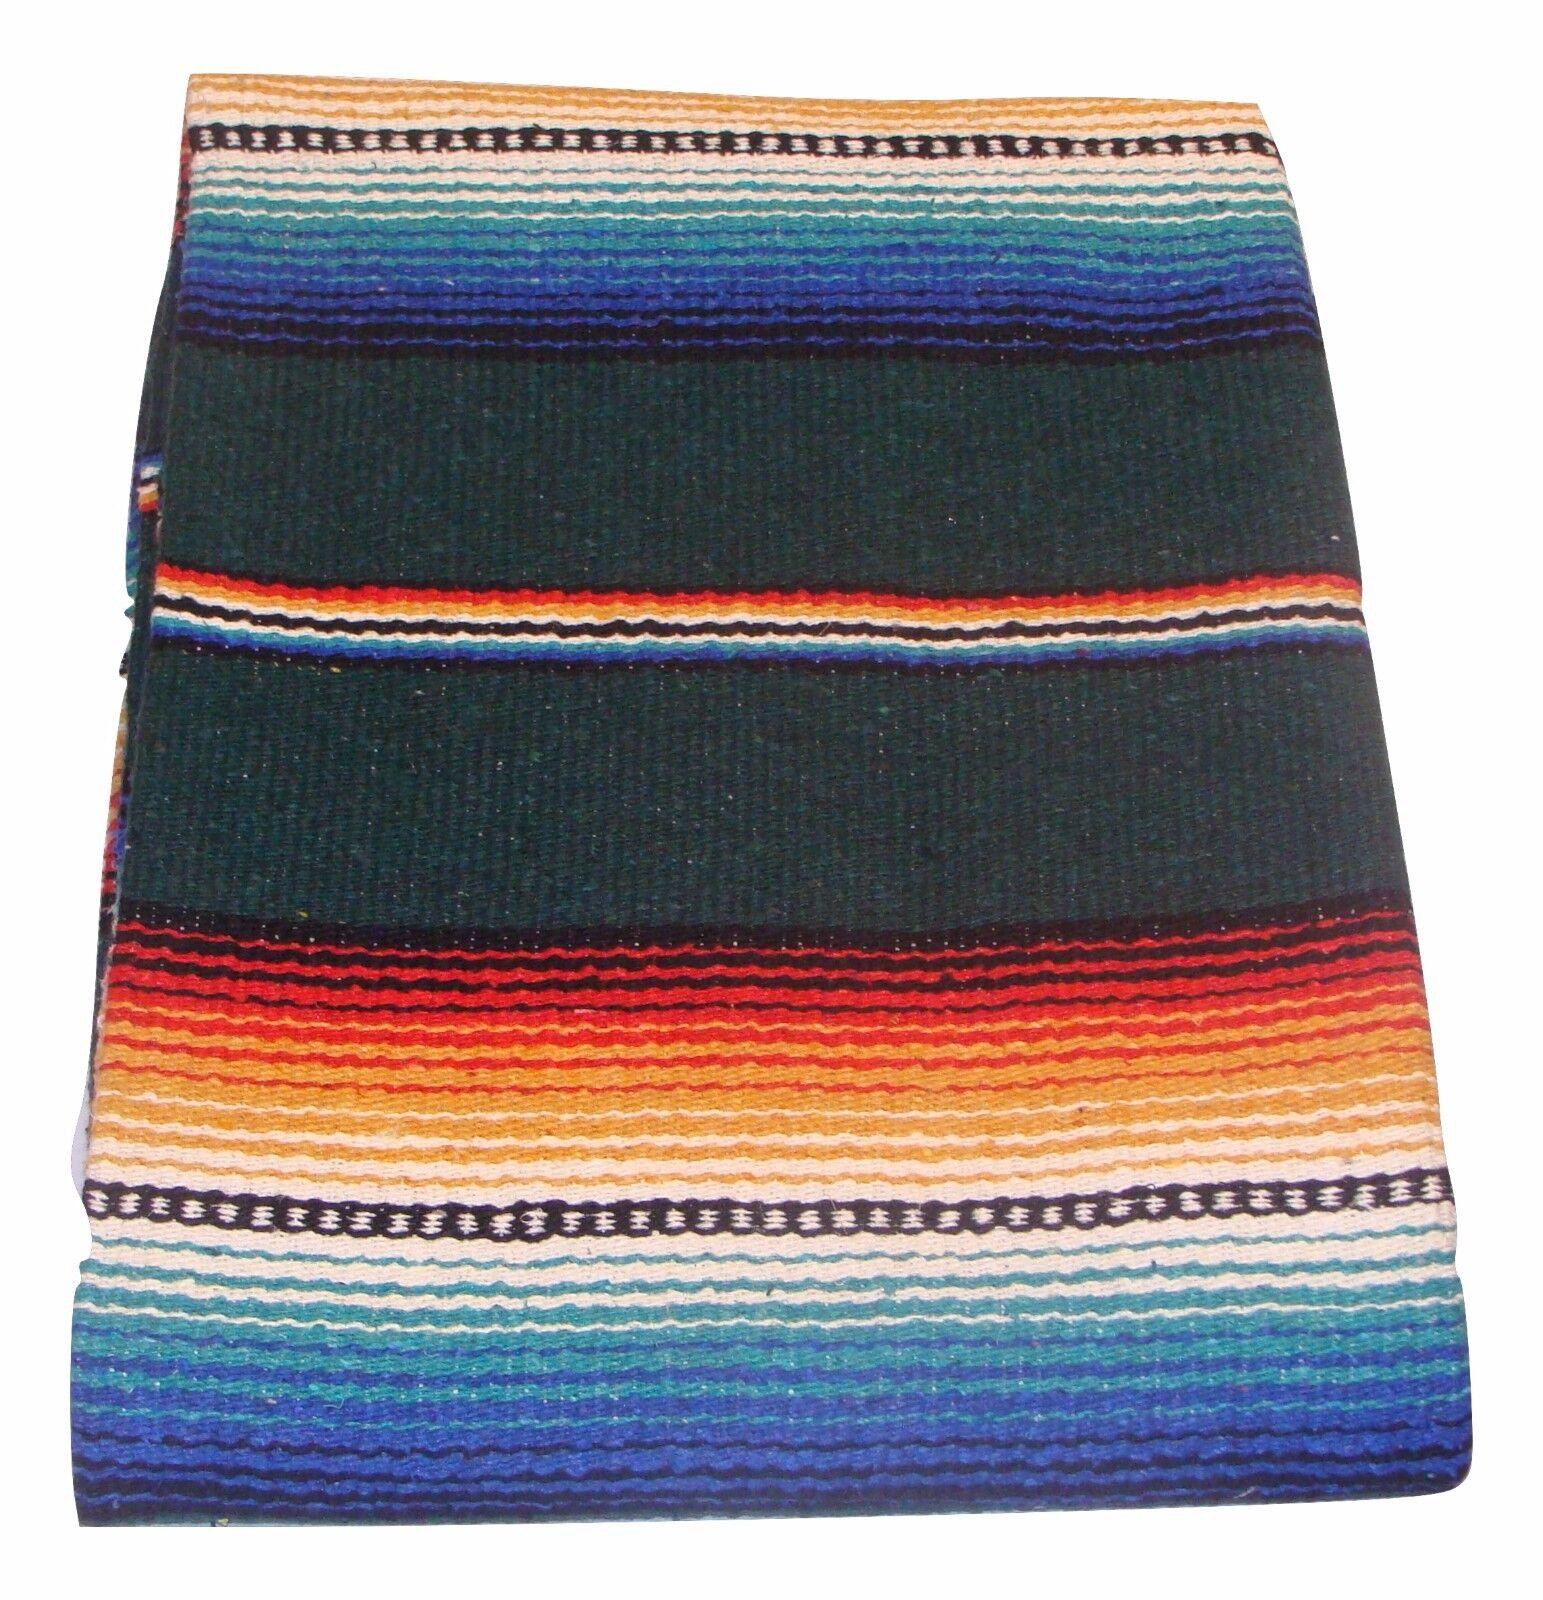 #776 Bedding Blankets Throws Sarape Blanket Teal Mexico Beach Yoga Travel Wrap